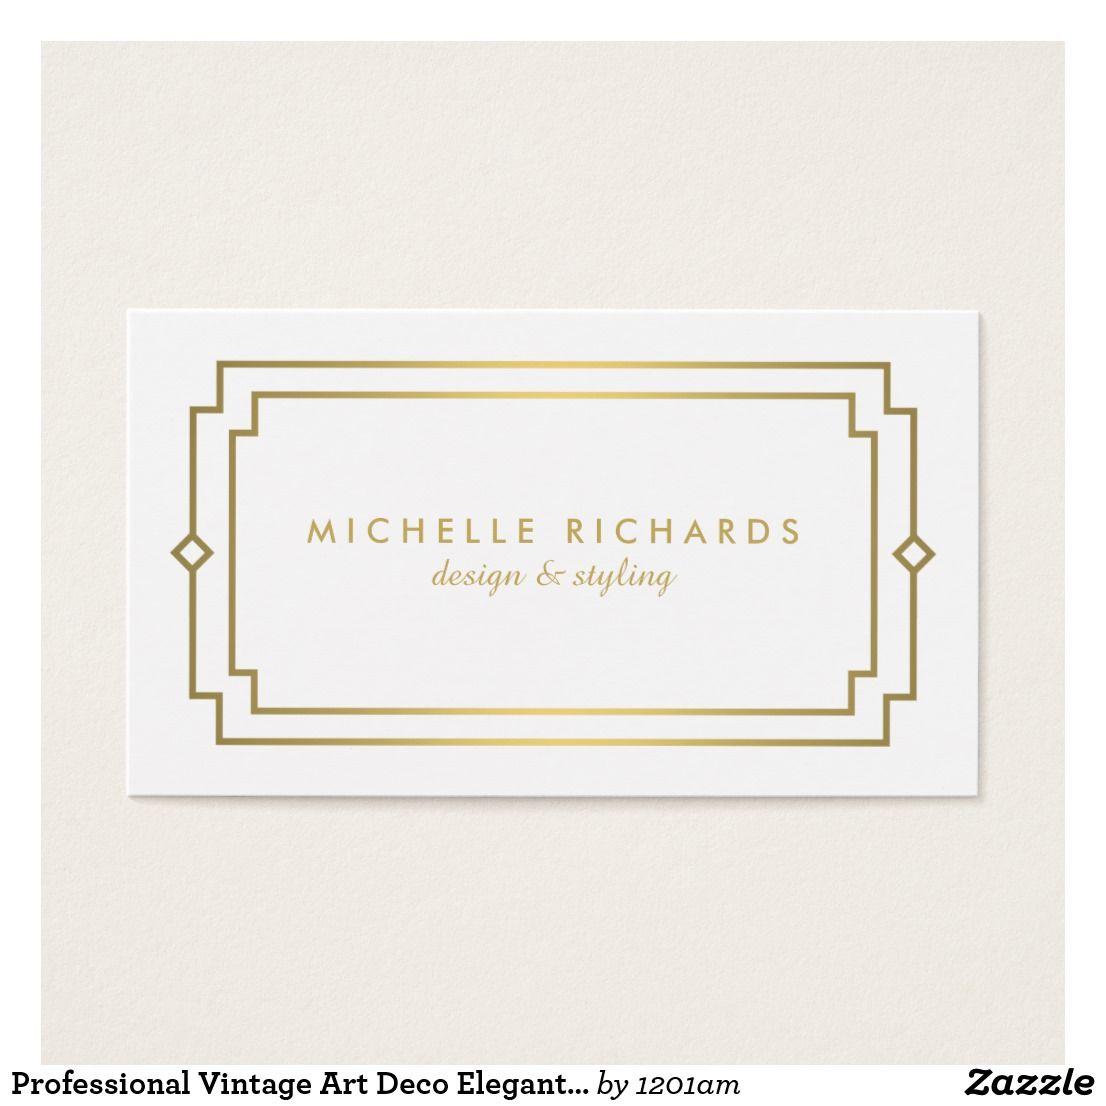 Professional vintage art deco elegant gold white business card professional vintage art deco elegant gold white business card reheart Gallery